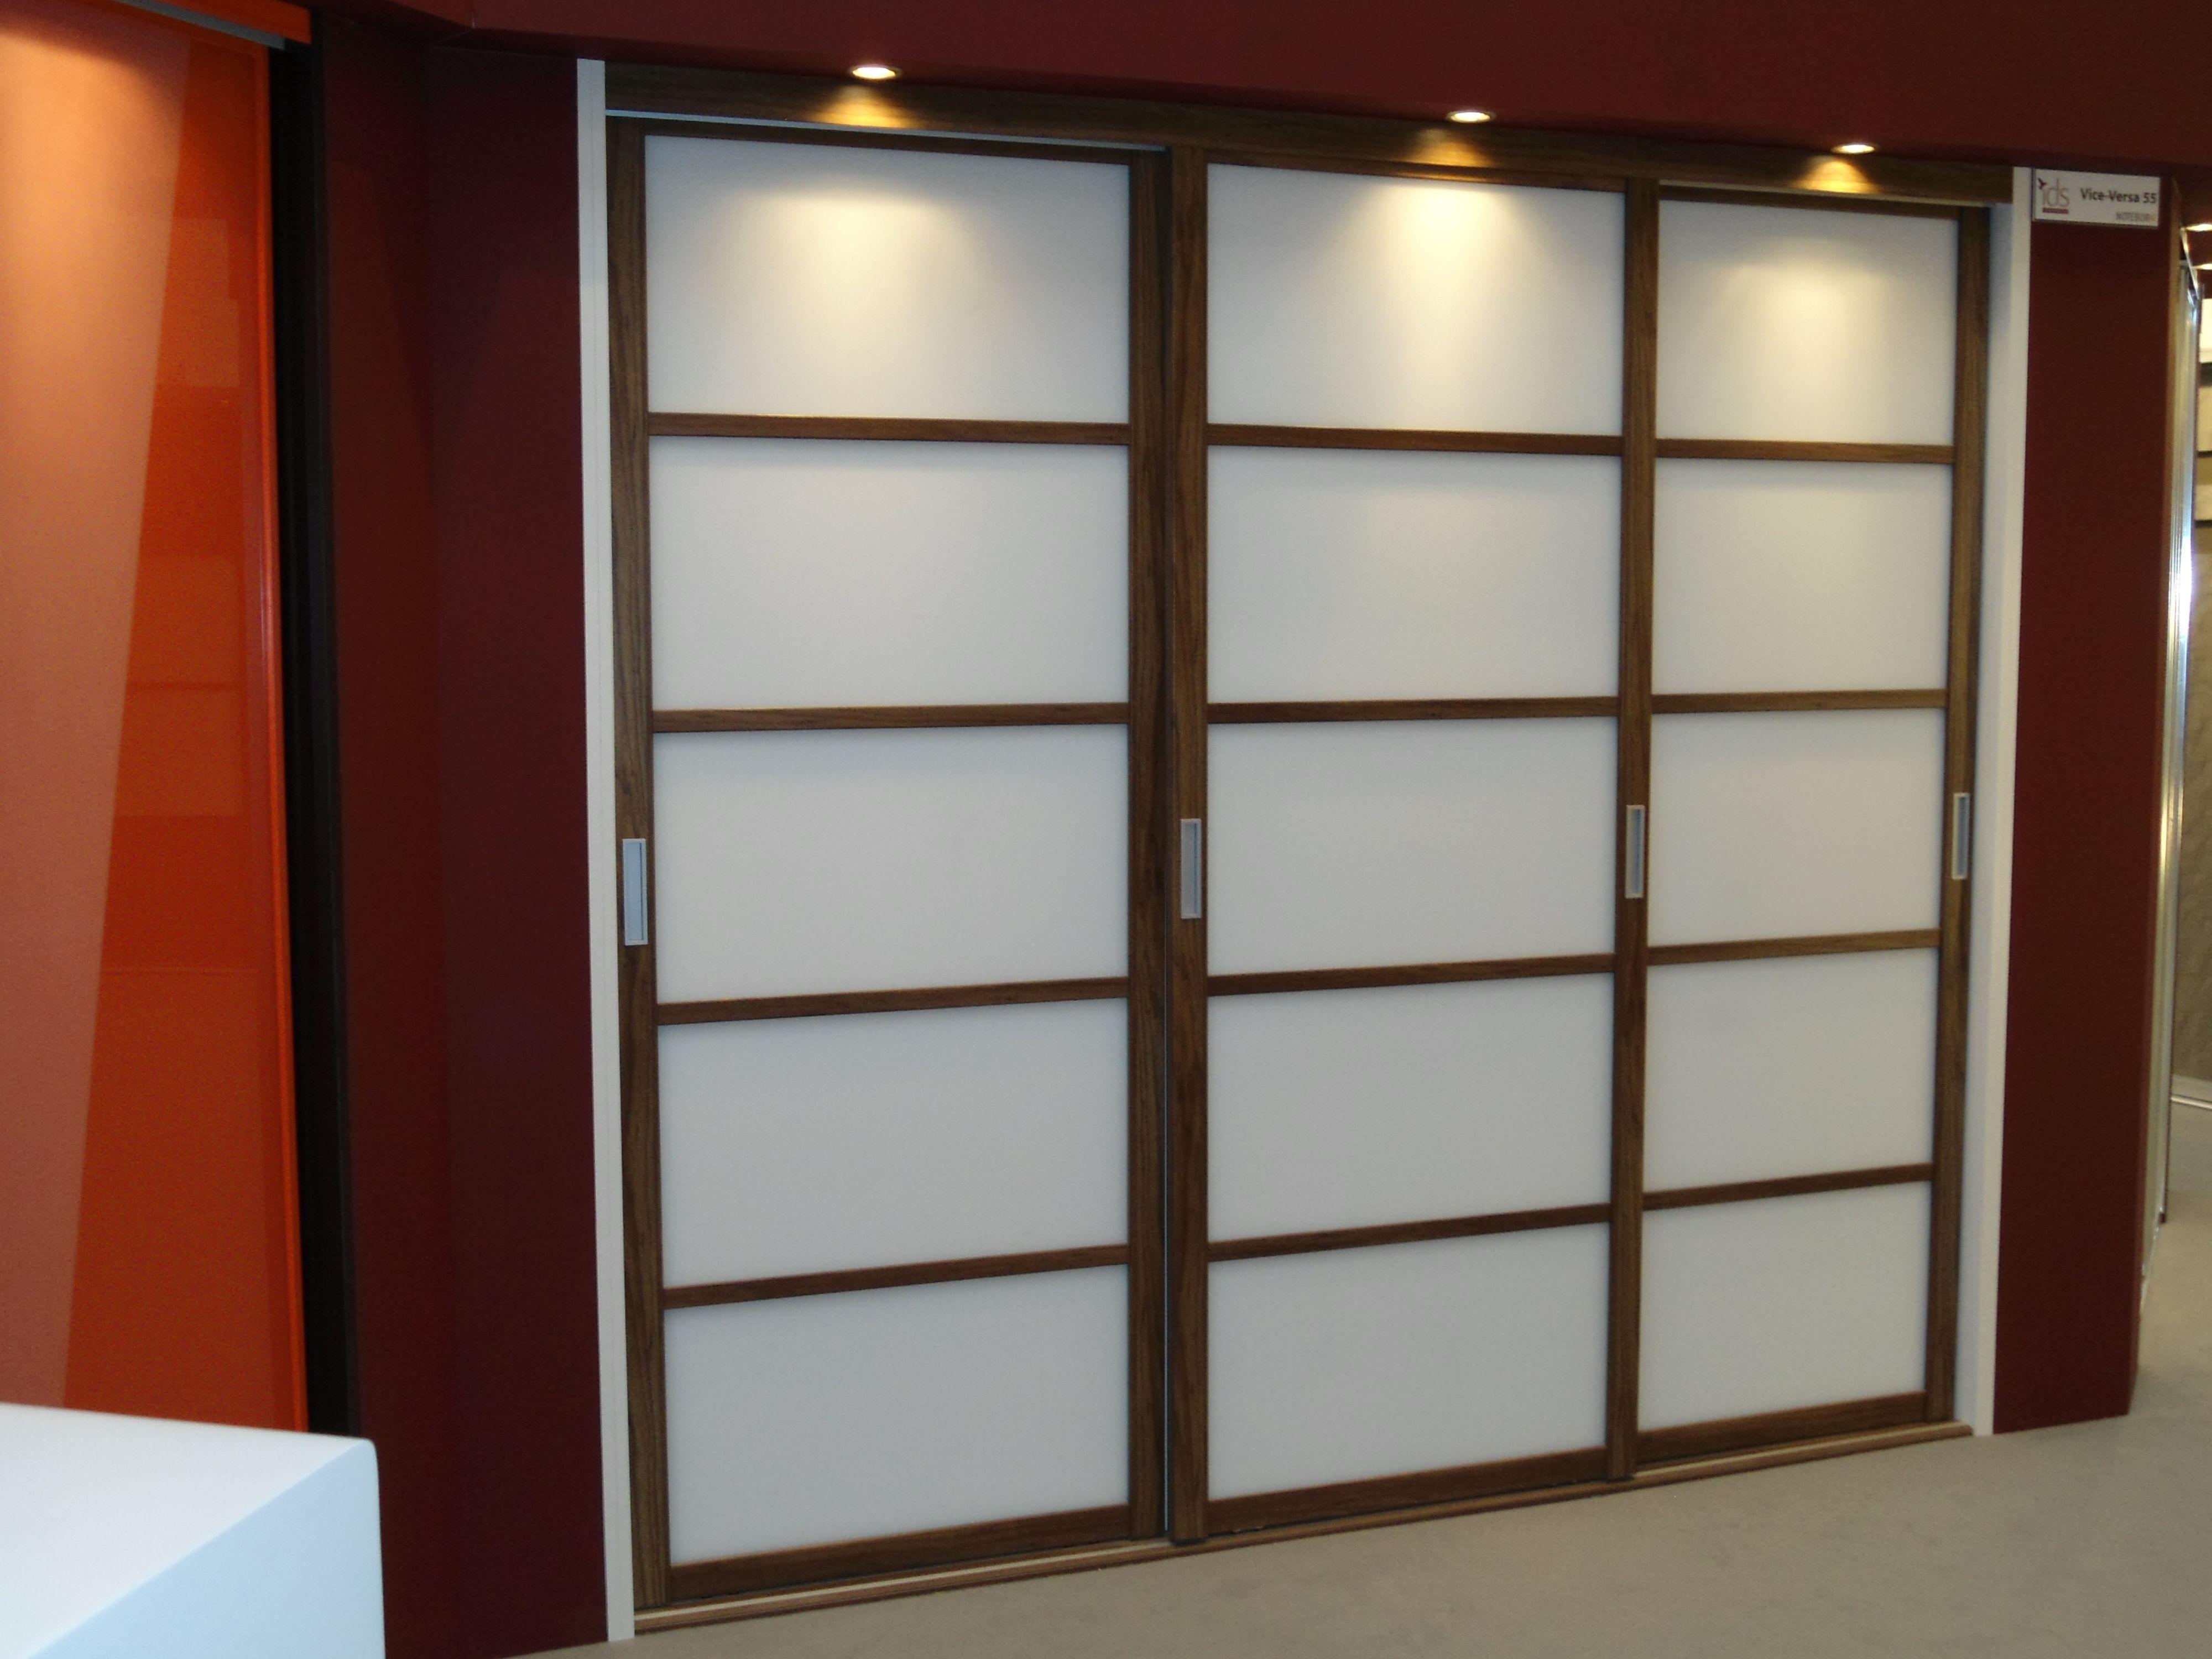 Superb 7176 Asian Style Sliding Doors Japanese Style Sliding Bedroom Doors Decor  Display Image Of Japanese Closet